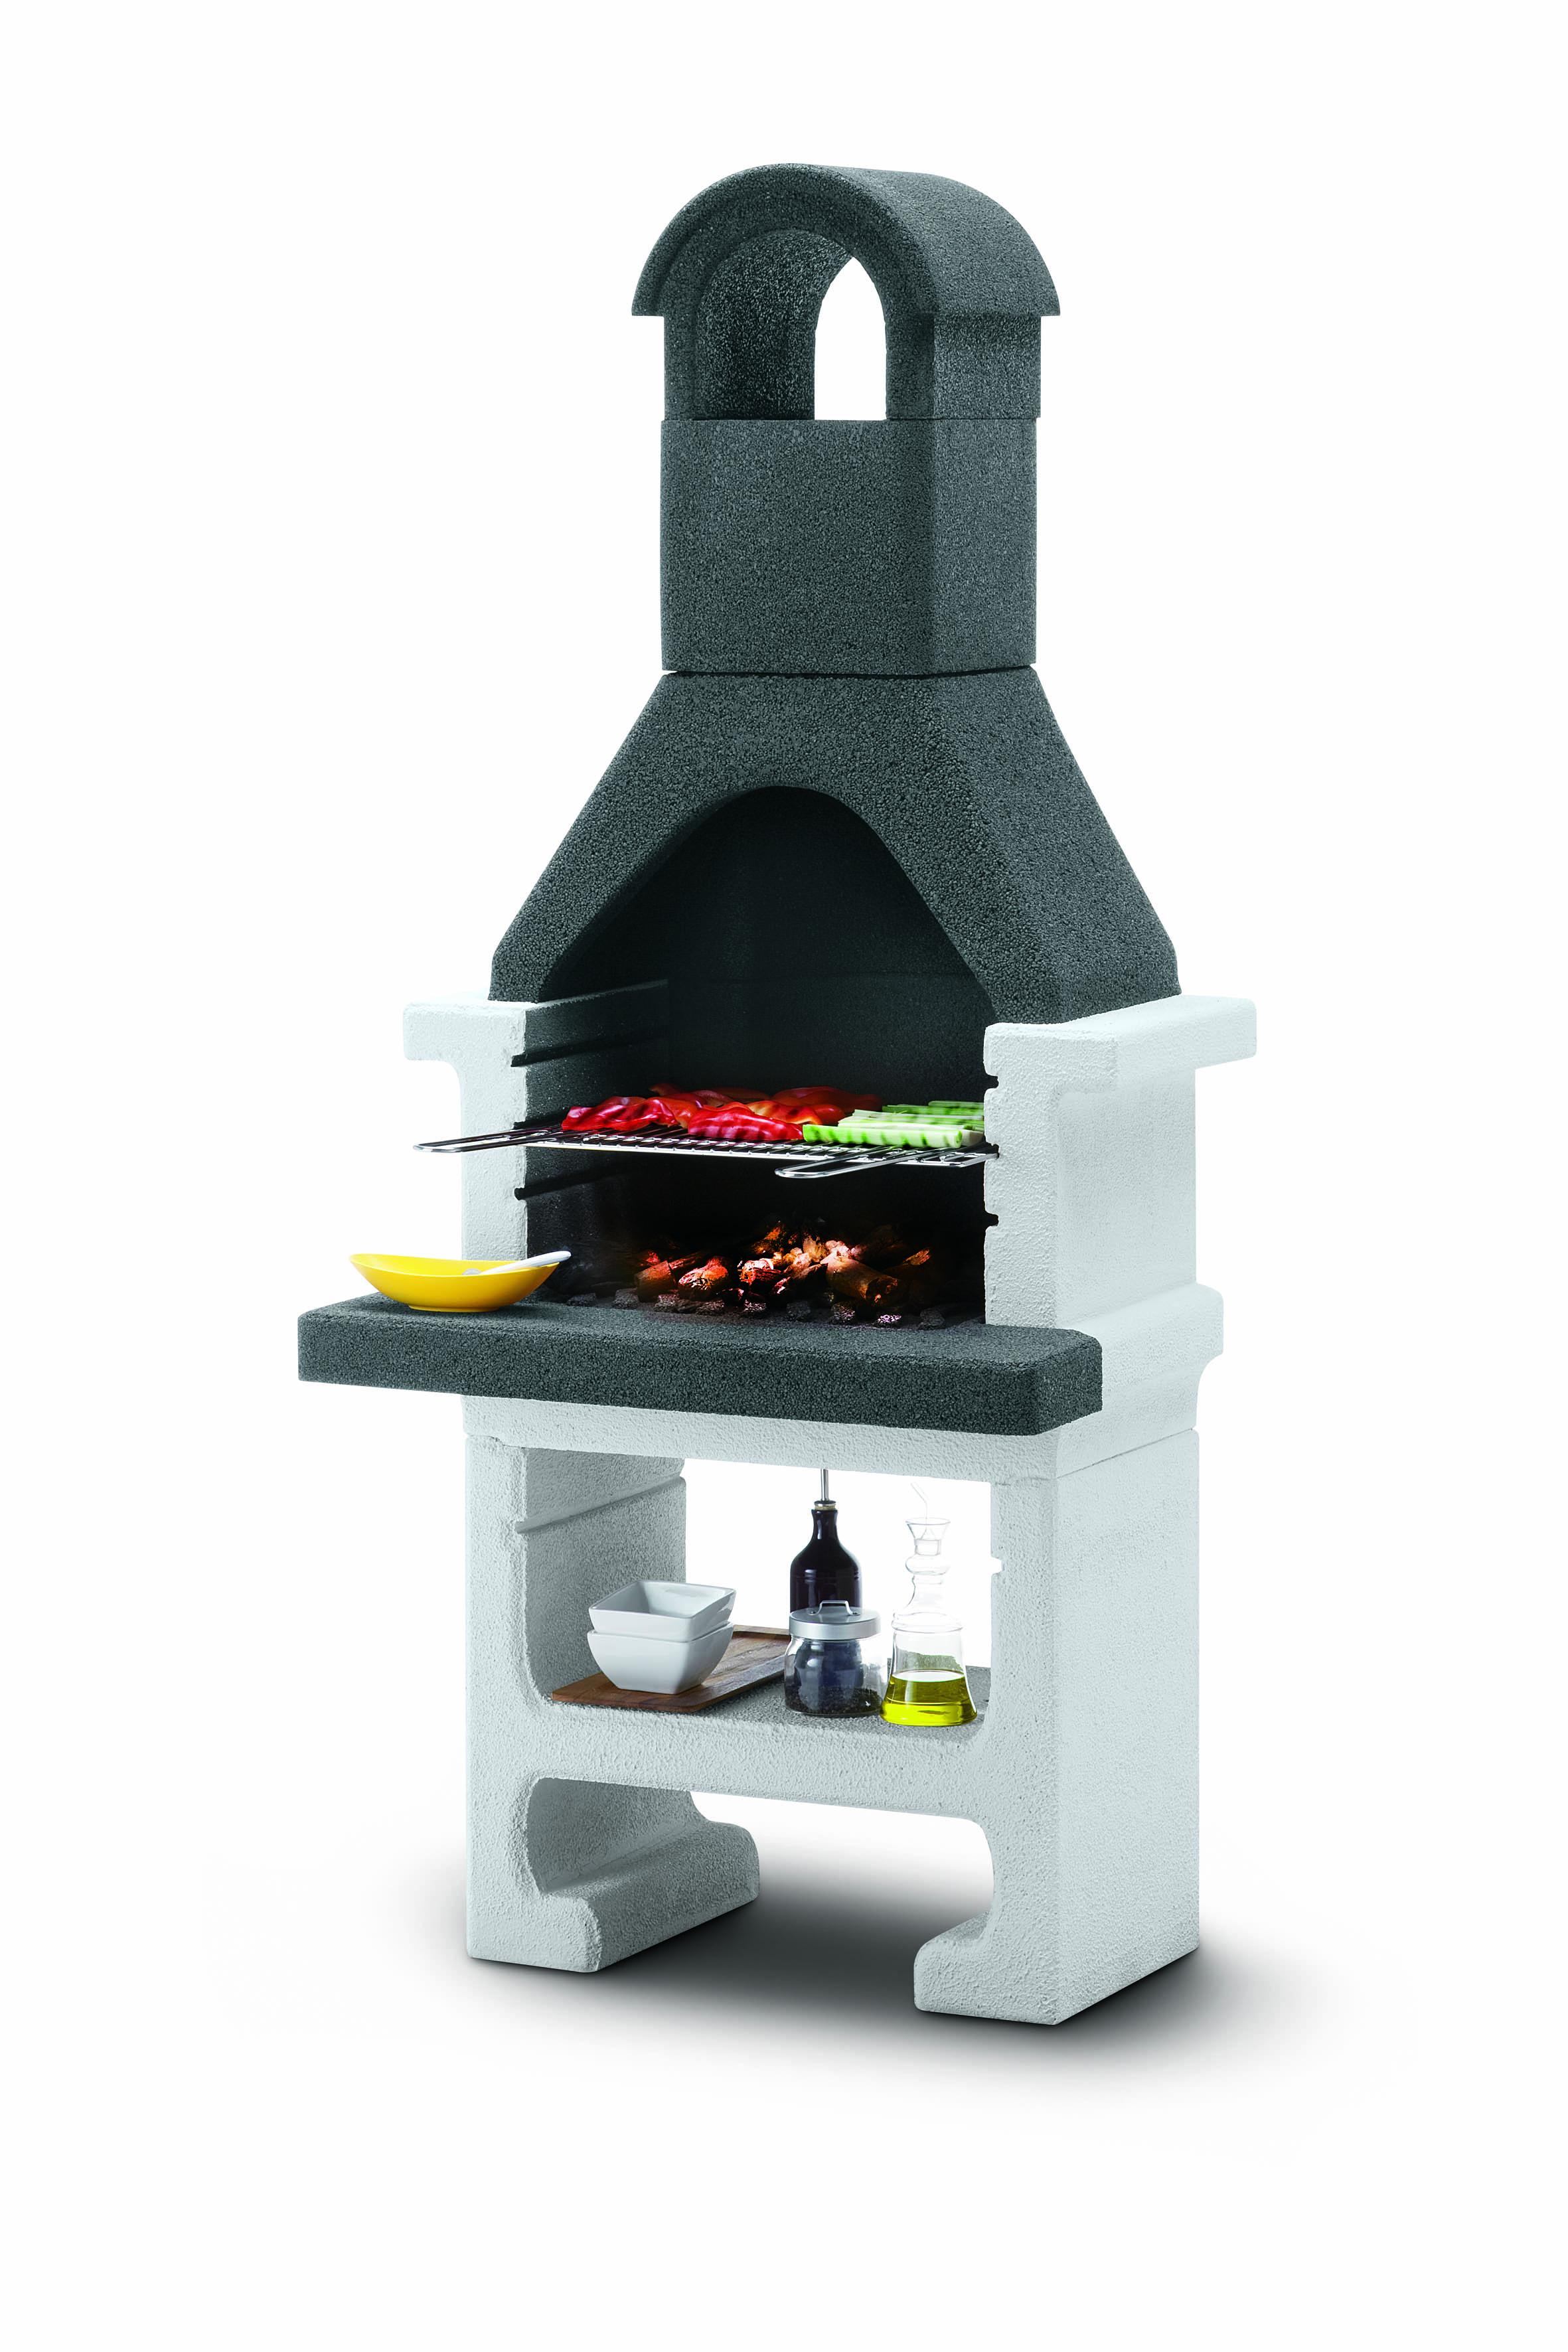 gemauerter grill kaufen wu76 kyushucon. Black Bedroom Furniture Sets. Home Design Ideas